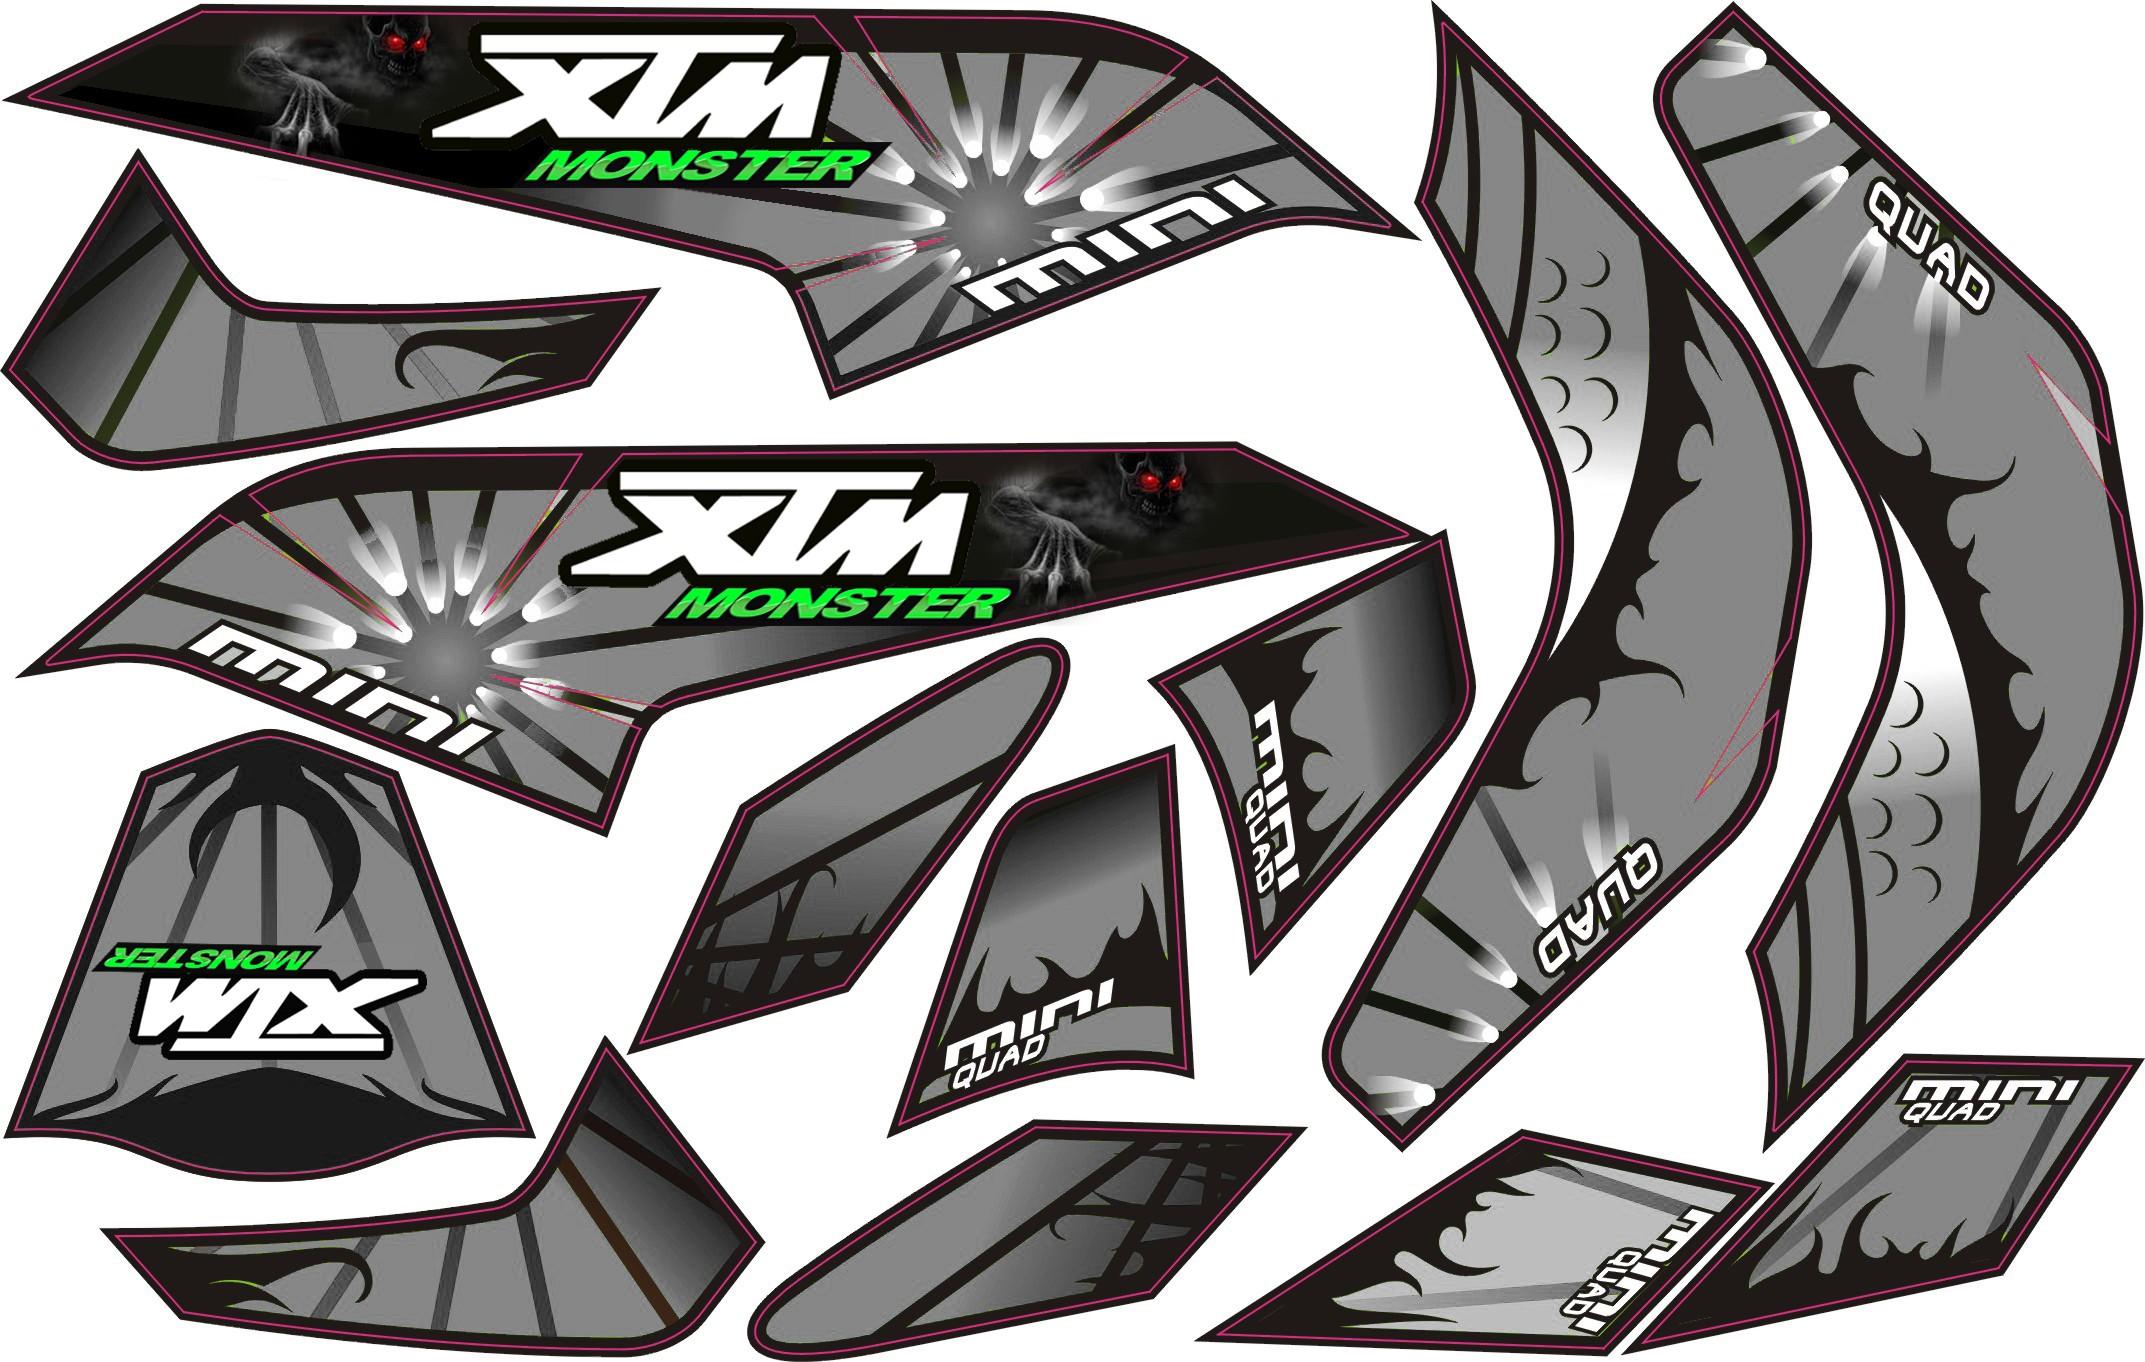 MINI QUAD BIKE XTM MONSTER STICKER KIT / DECALS / TRANSFERS IN SILVER